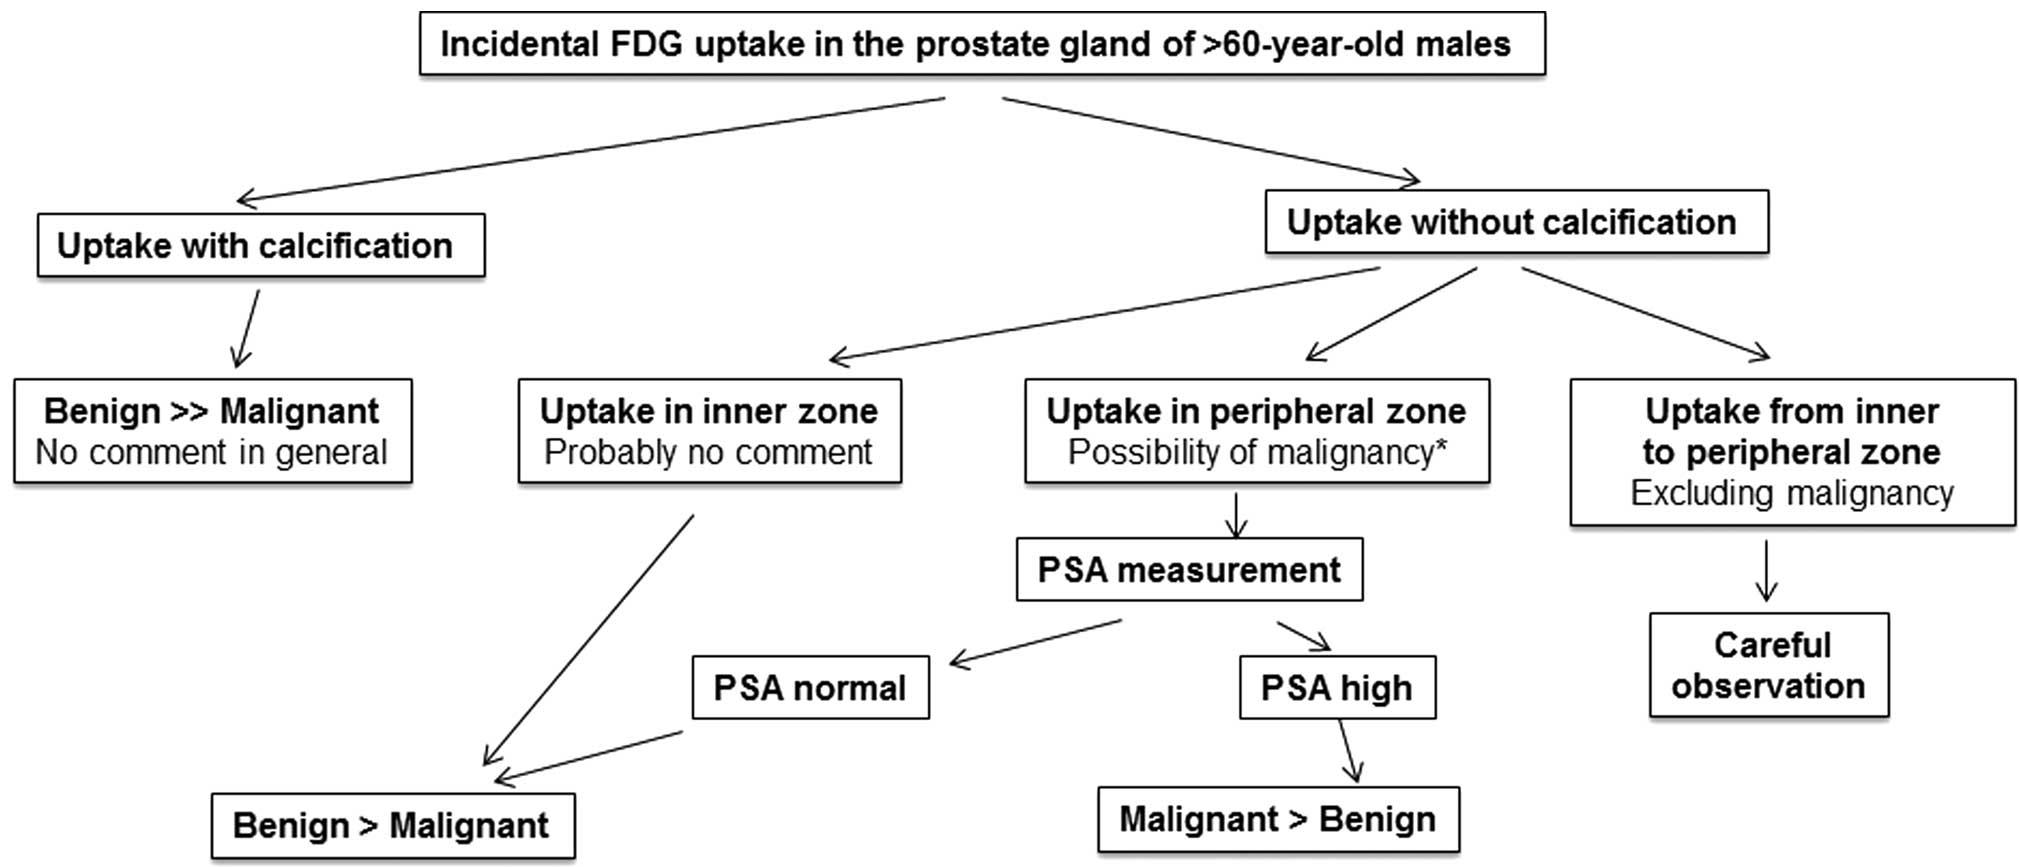 Incidental Prostate 18f Fdg Uptake Without Calcification Indicates